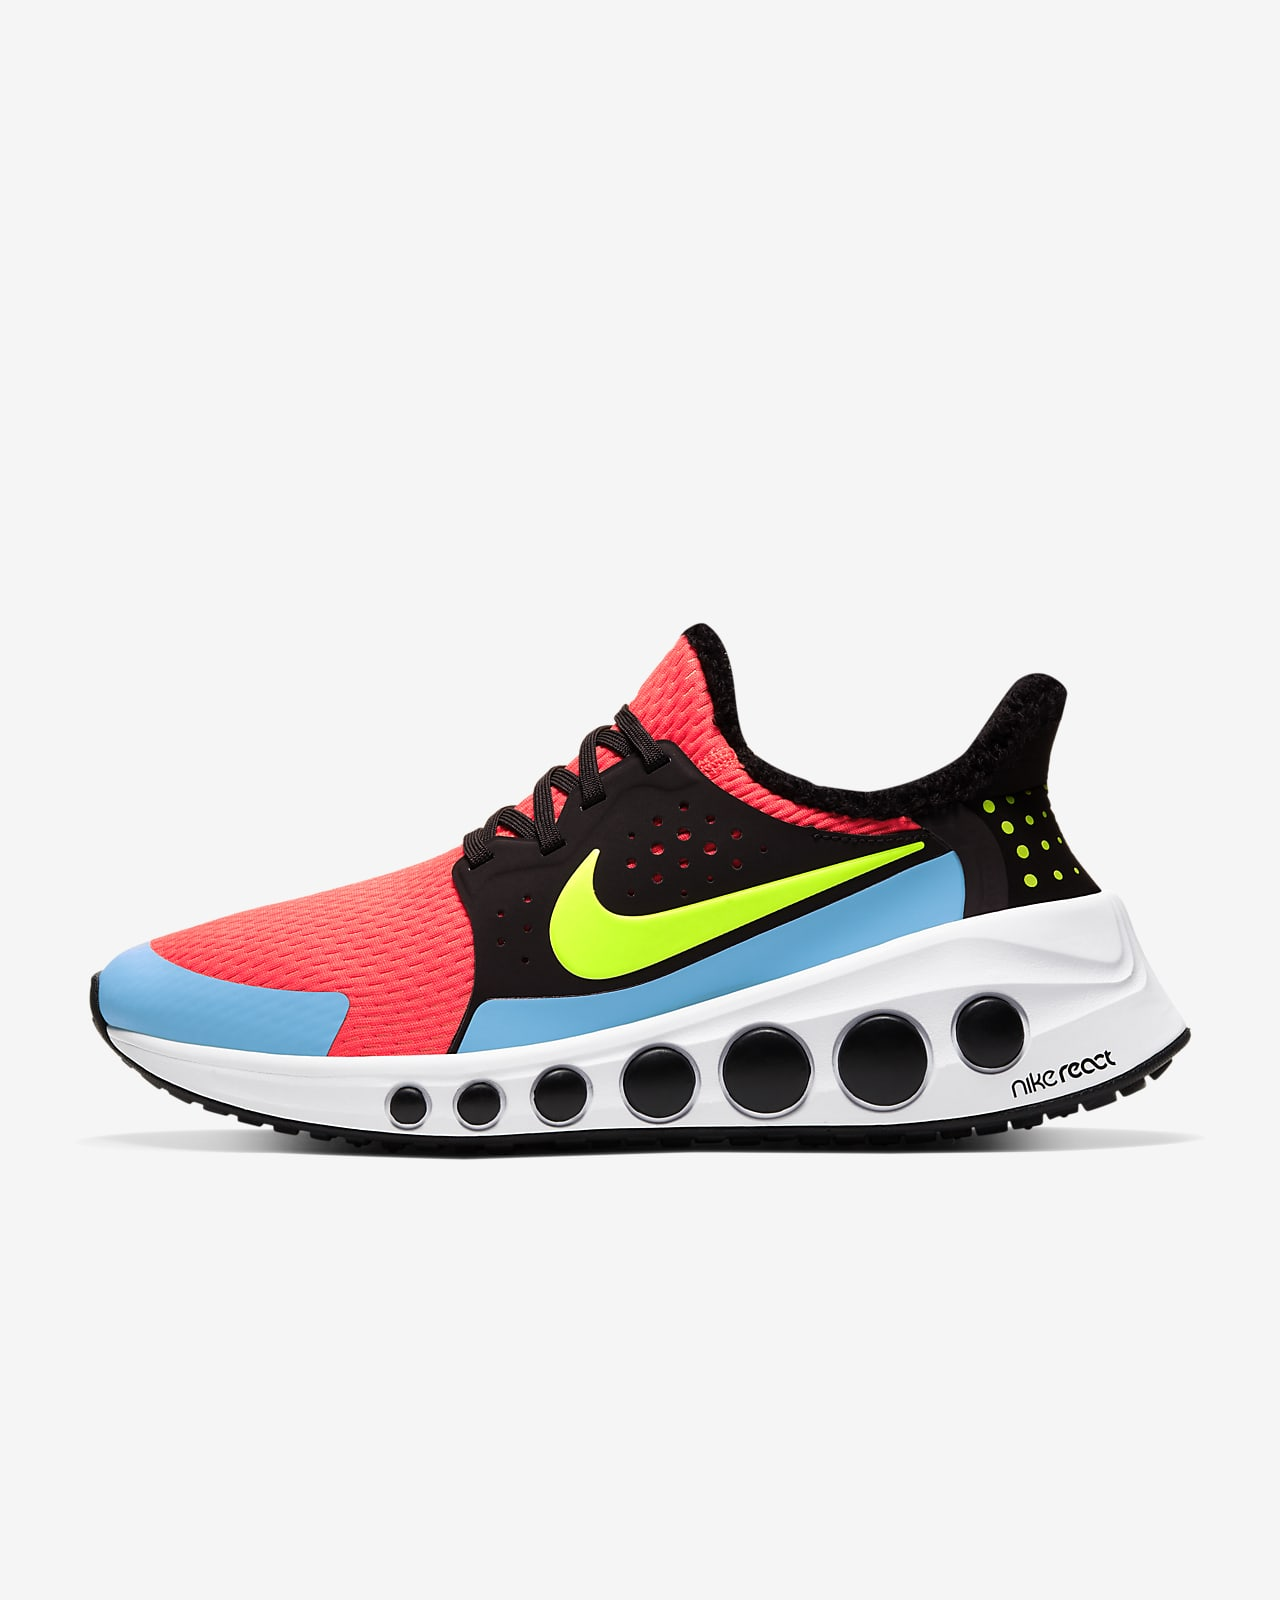 Nike CruzrOne (Bright Crimson) Shoe